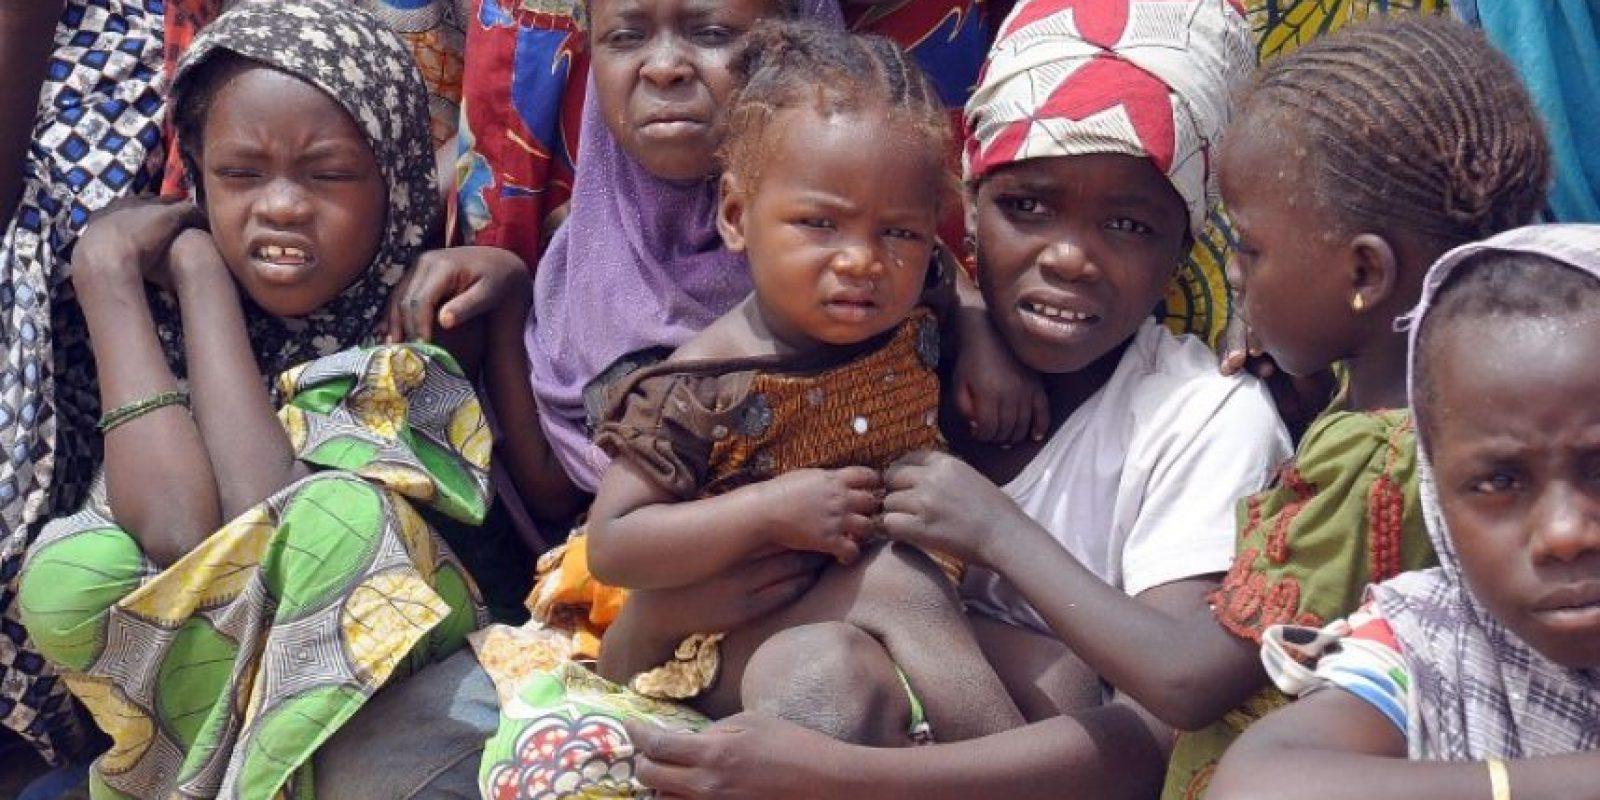 10. Níger: 11% de mortalidad infantil, 91 mil muertes al año Foto:AFP